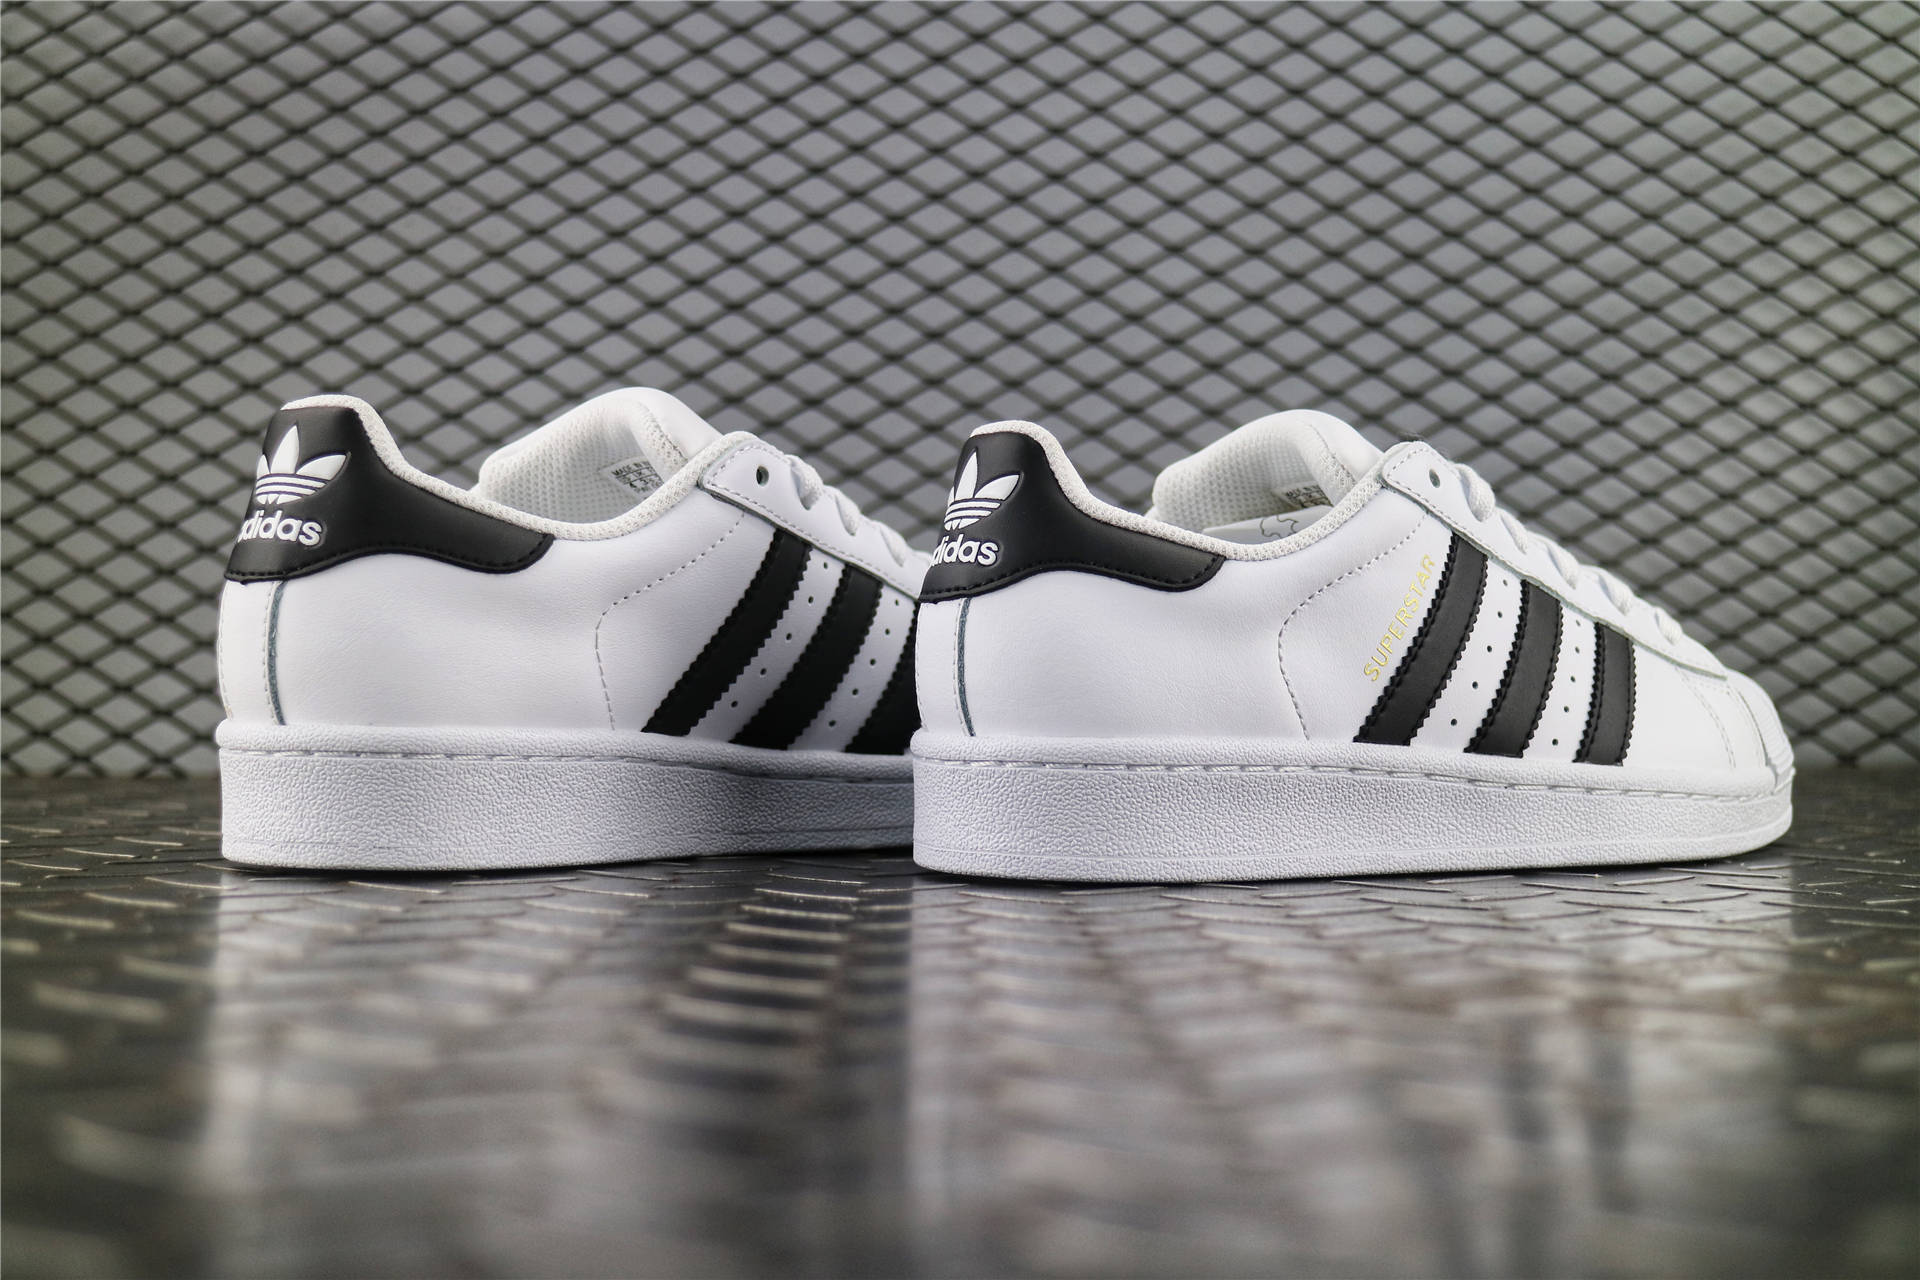 Кроссовки женские Adidas Superstar WMNS 80s DLX Vintage White   Core Black 36f3052ae2336